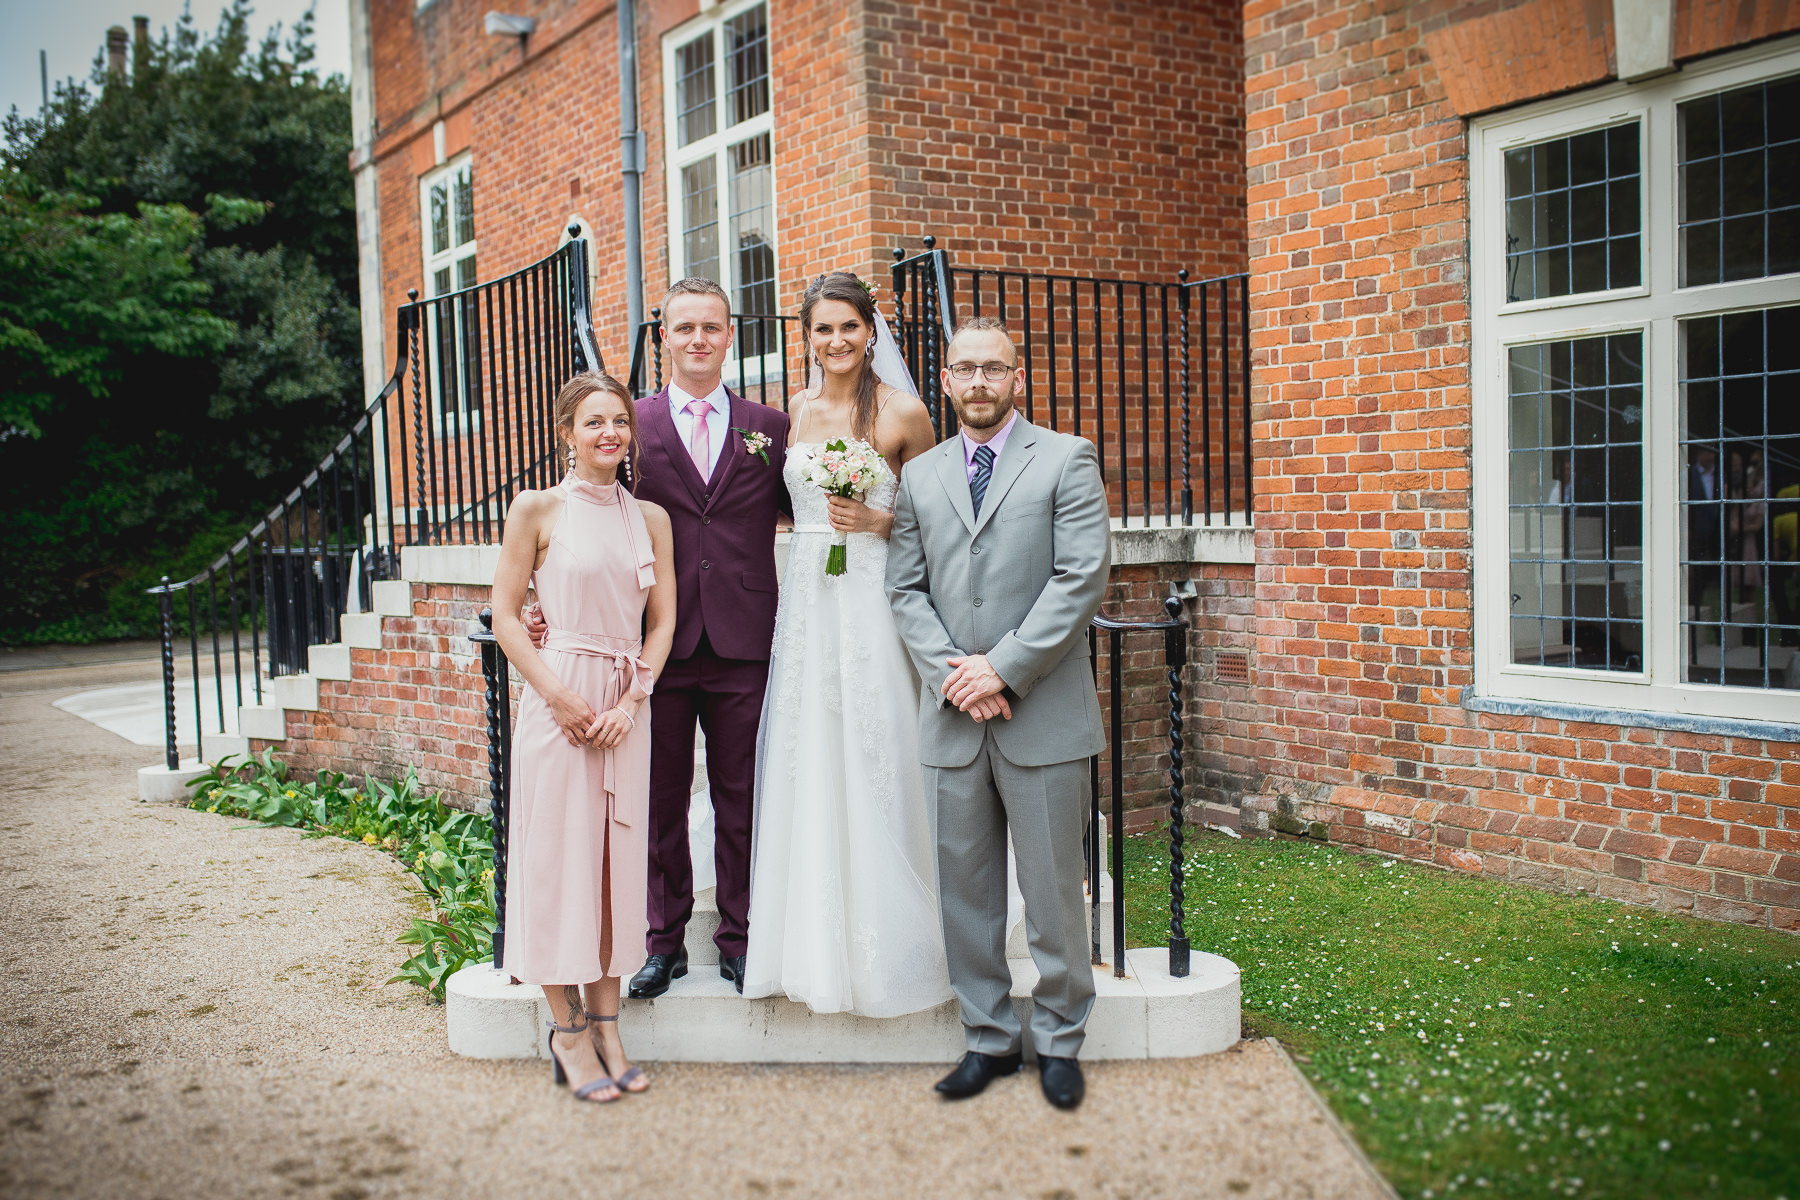 Dangira & Ignas Chichester Town Hall Sussex Weddings  7.jpg